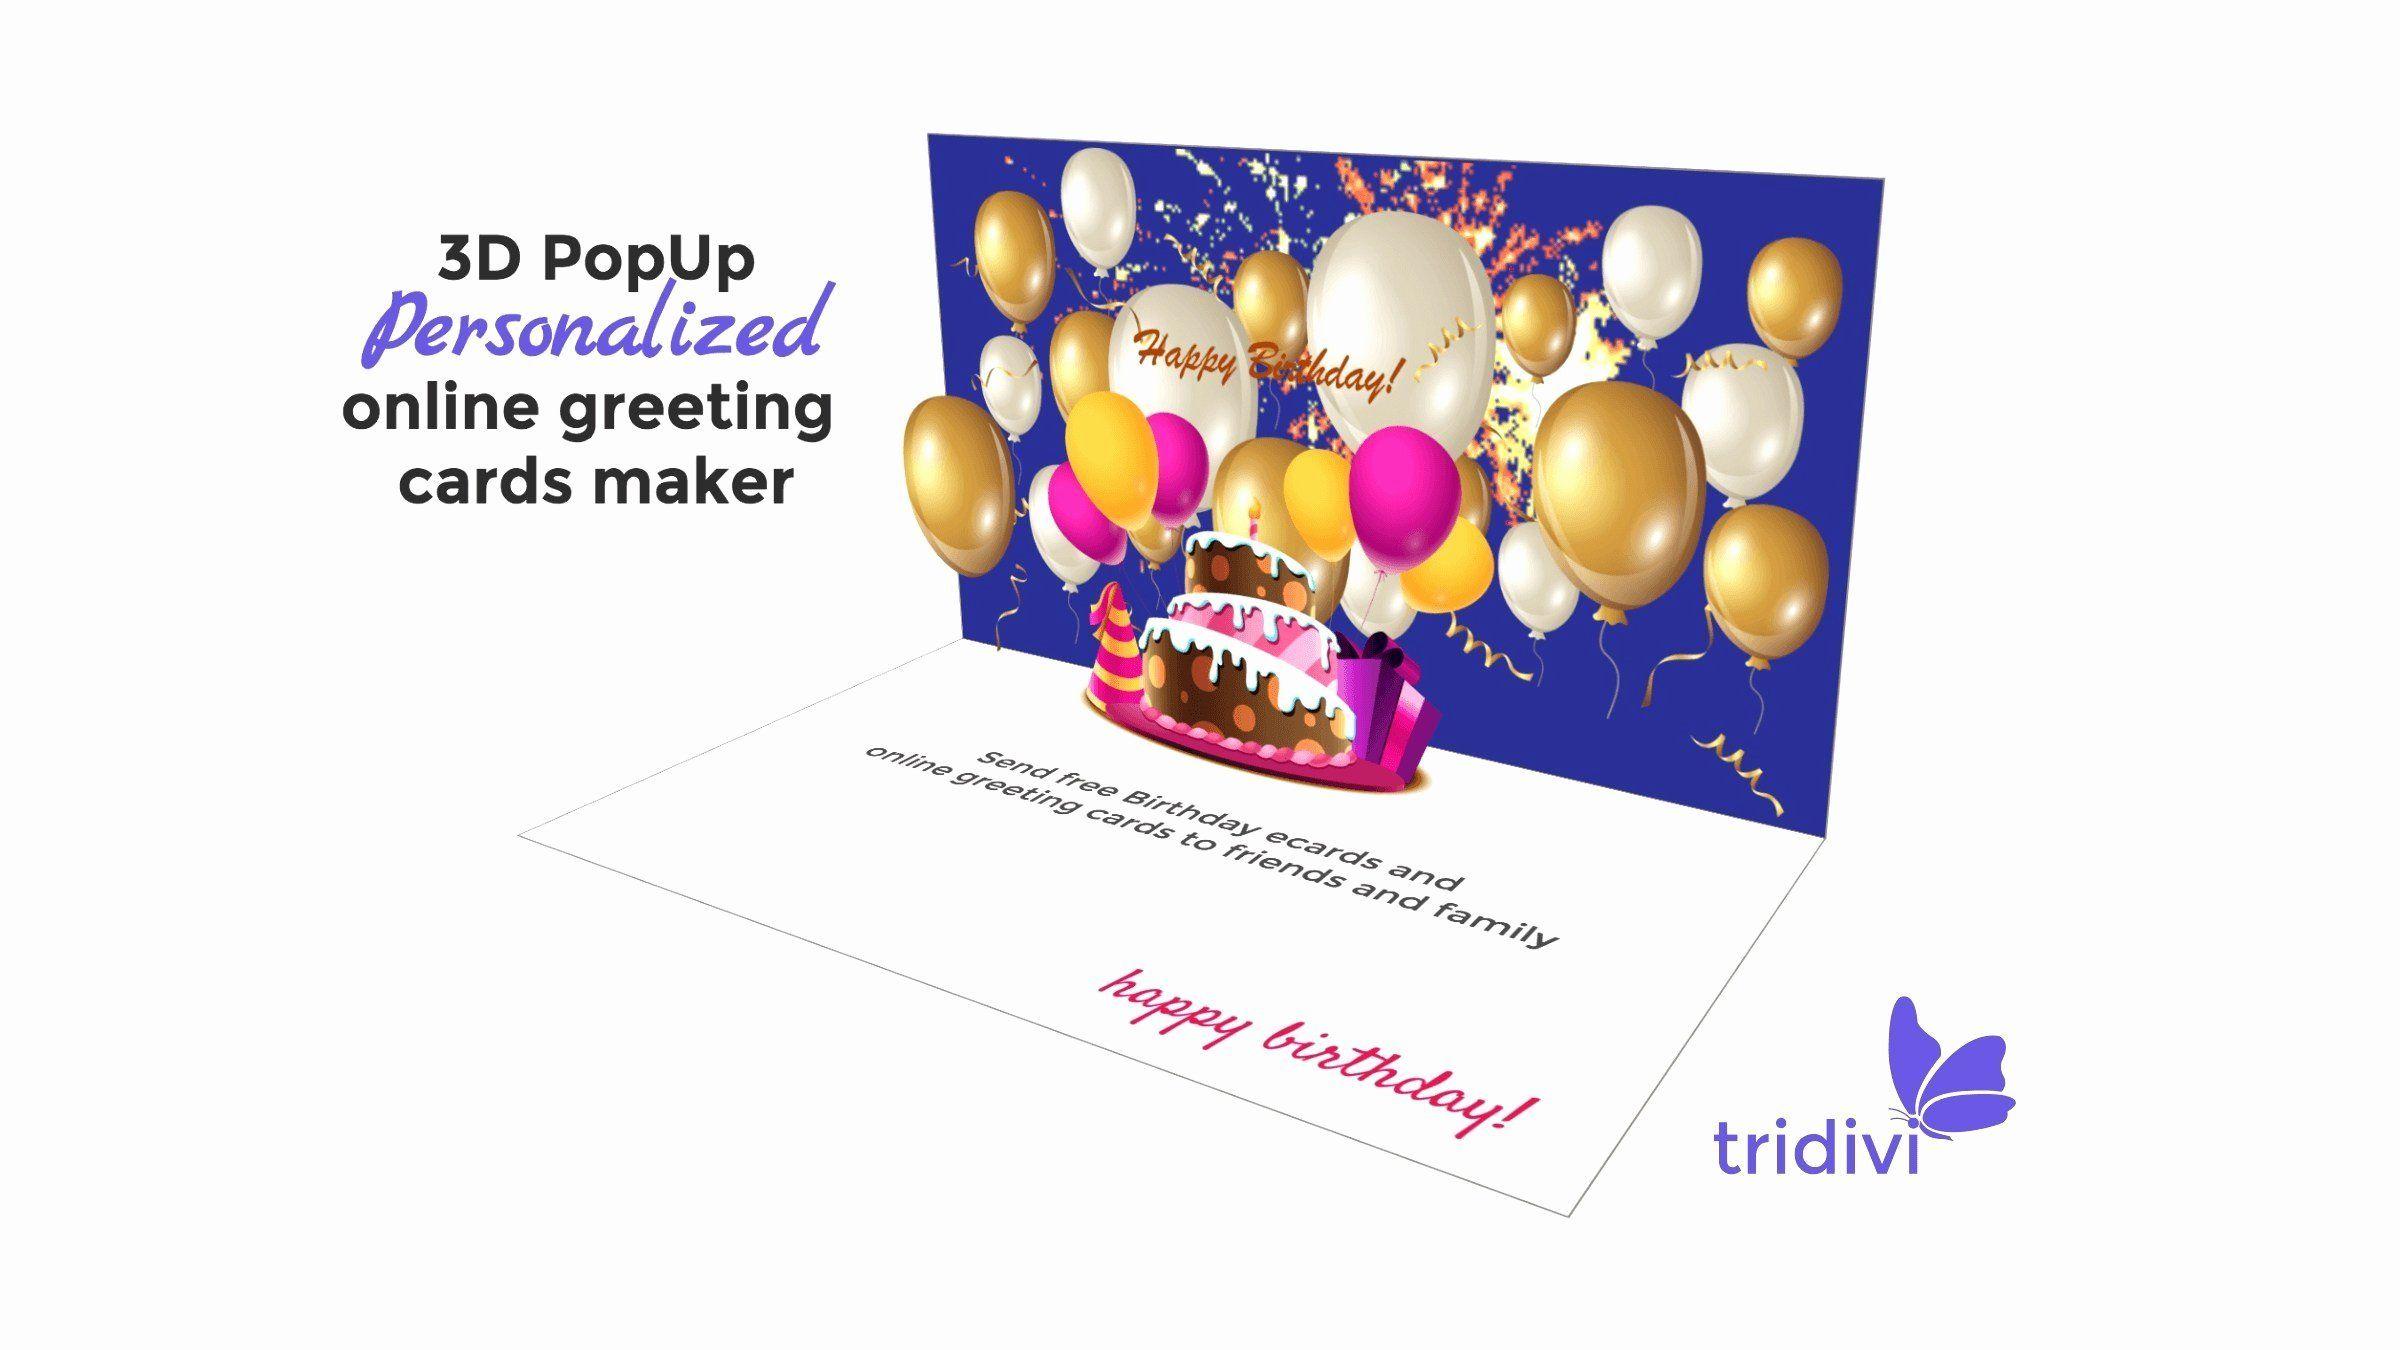 Rosh Hashanah Wishes In 2020 Birthday Card Online Birthday Card